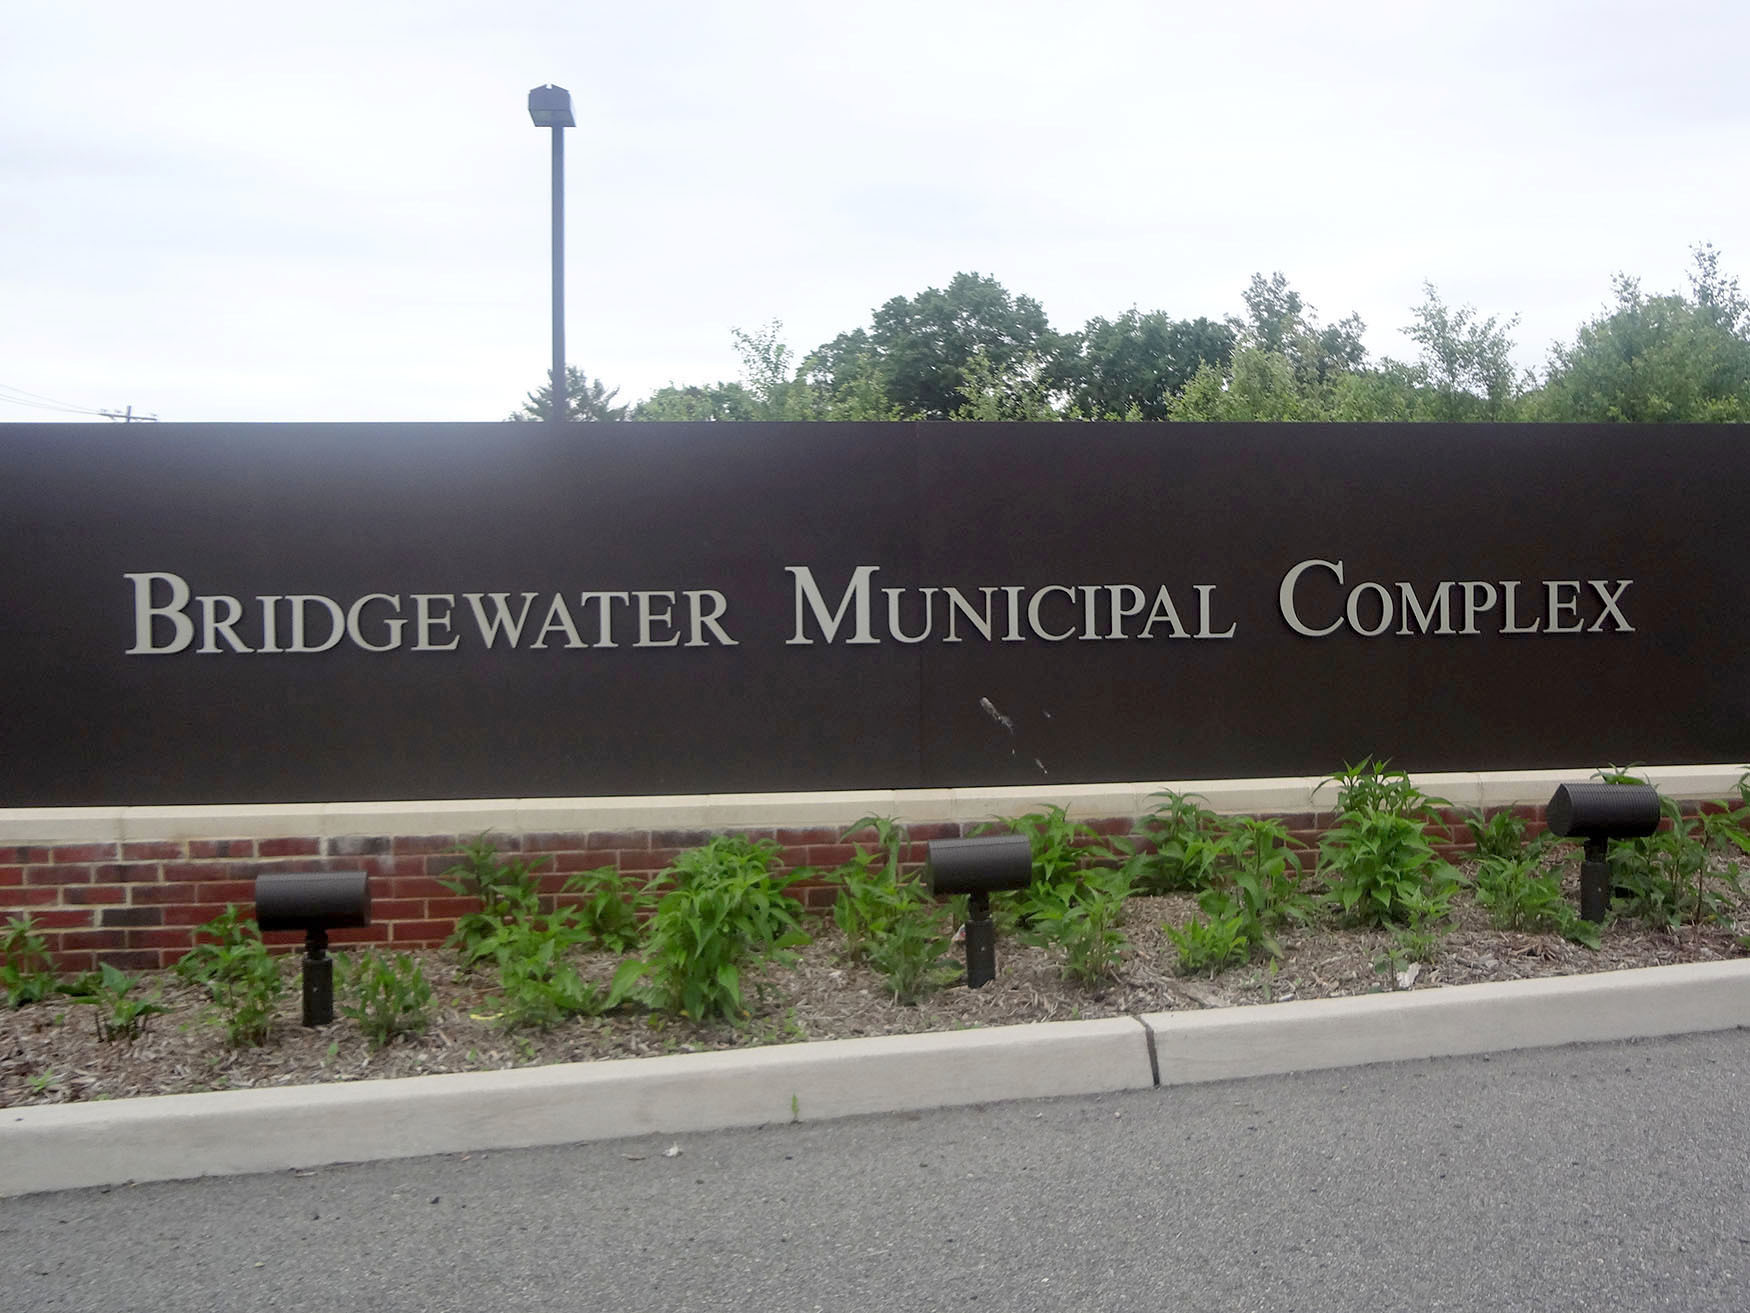 dac9668c55900108baab_Bridgewater_municipal.jpg